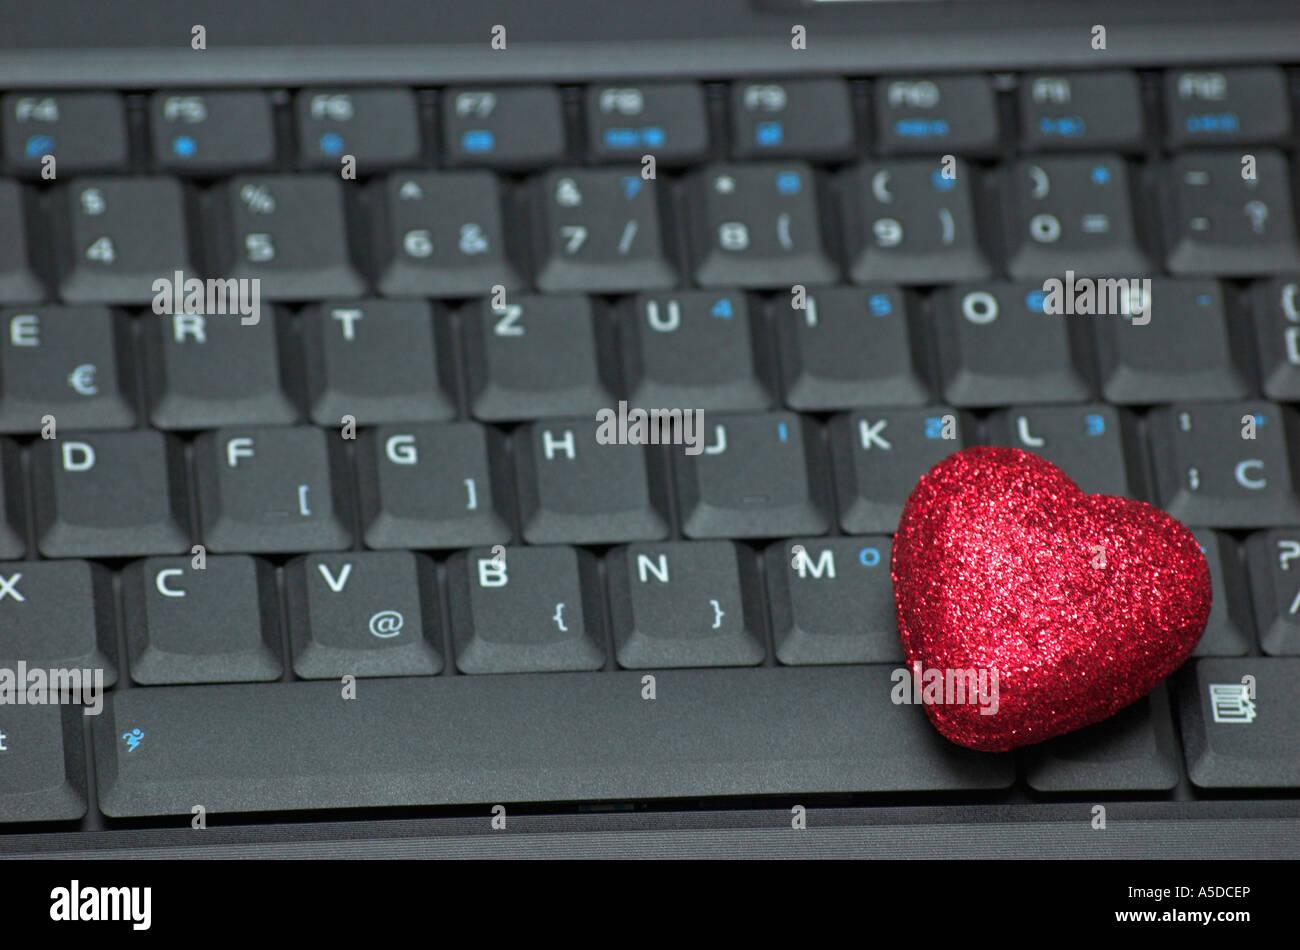 Heart Shape Symbol On Computer Keyboard Stock Photo 11278125 Alamy